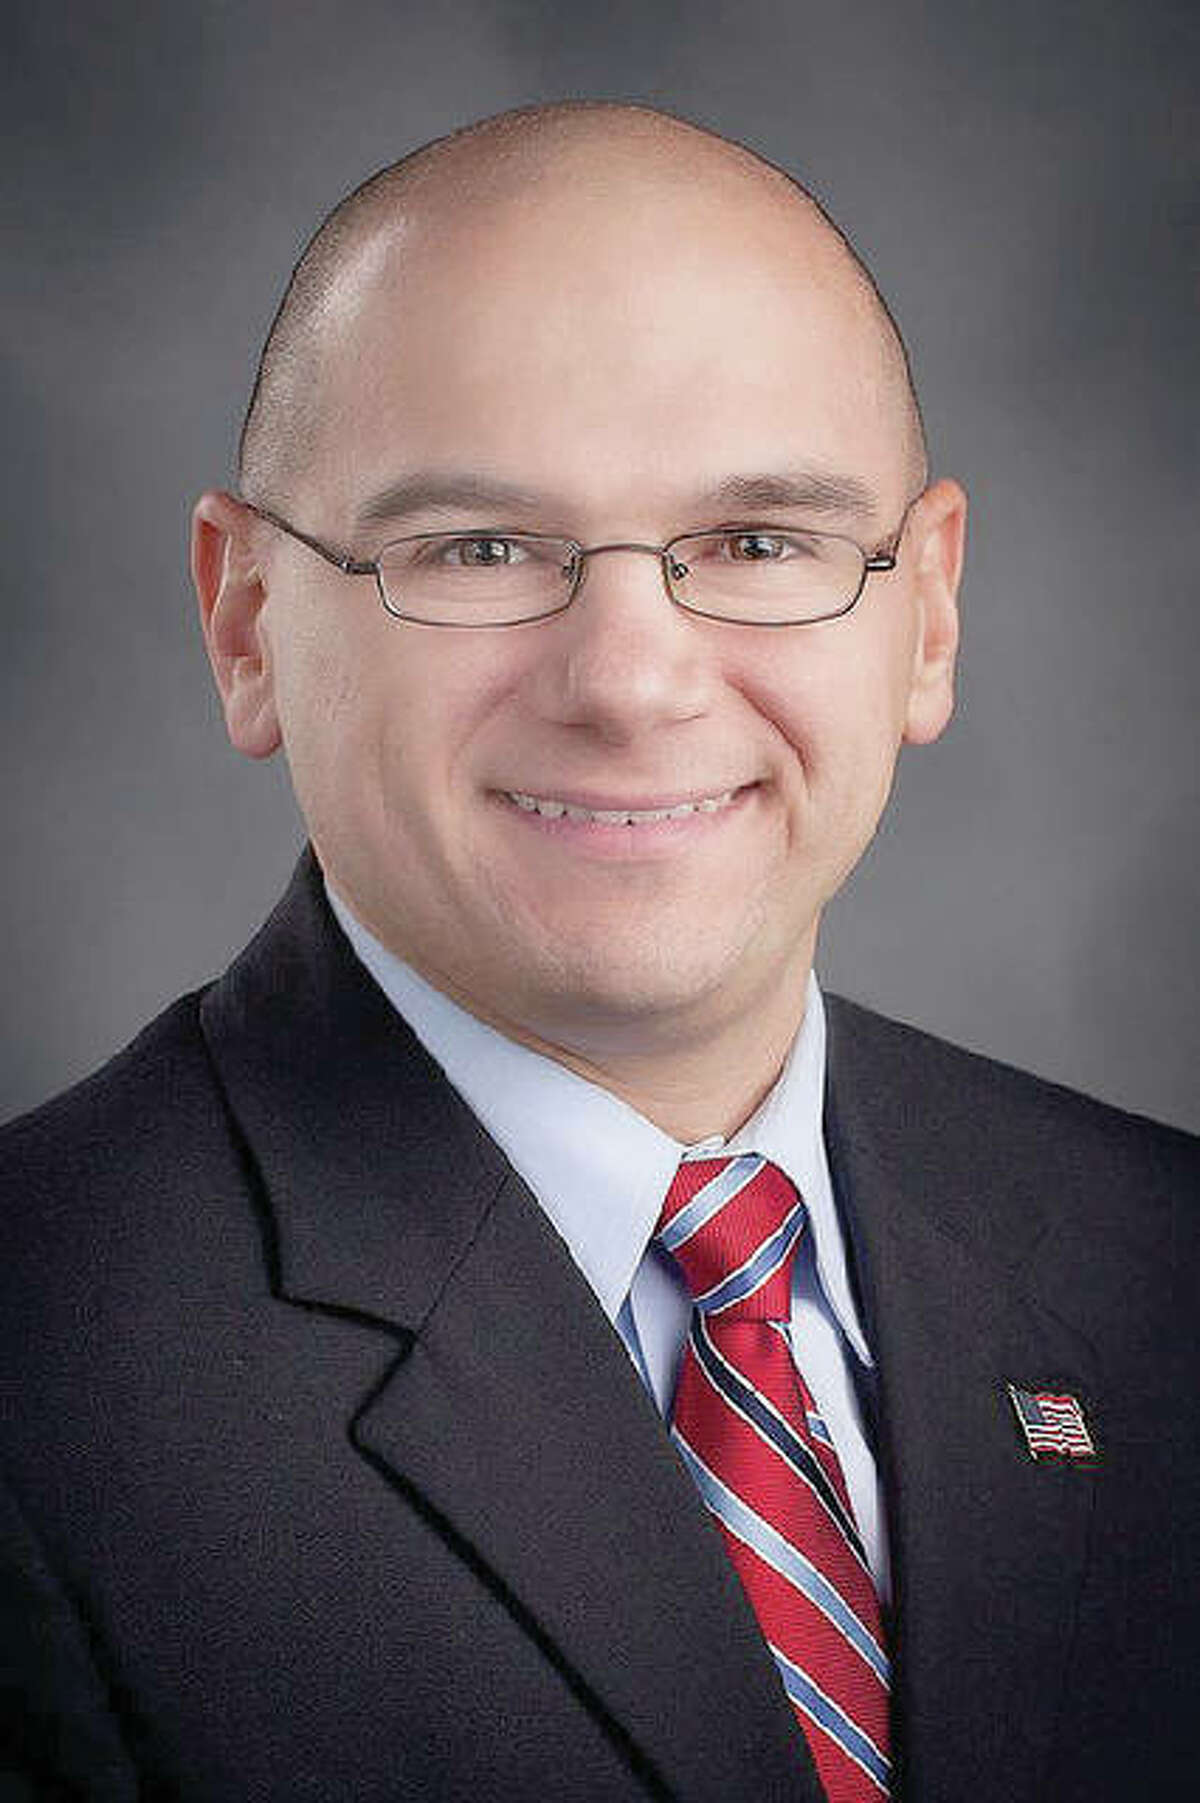 Greene County State's Attorney Caleb Briscoe wassworn in Monday, Nov. 30.